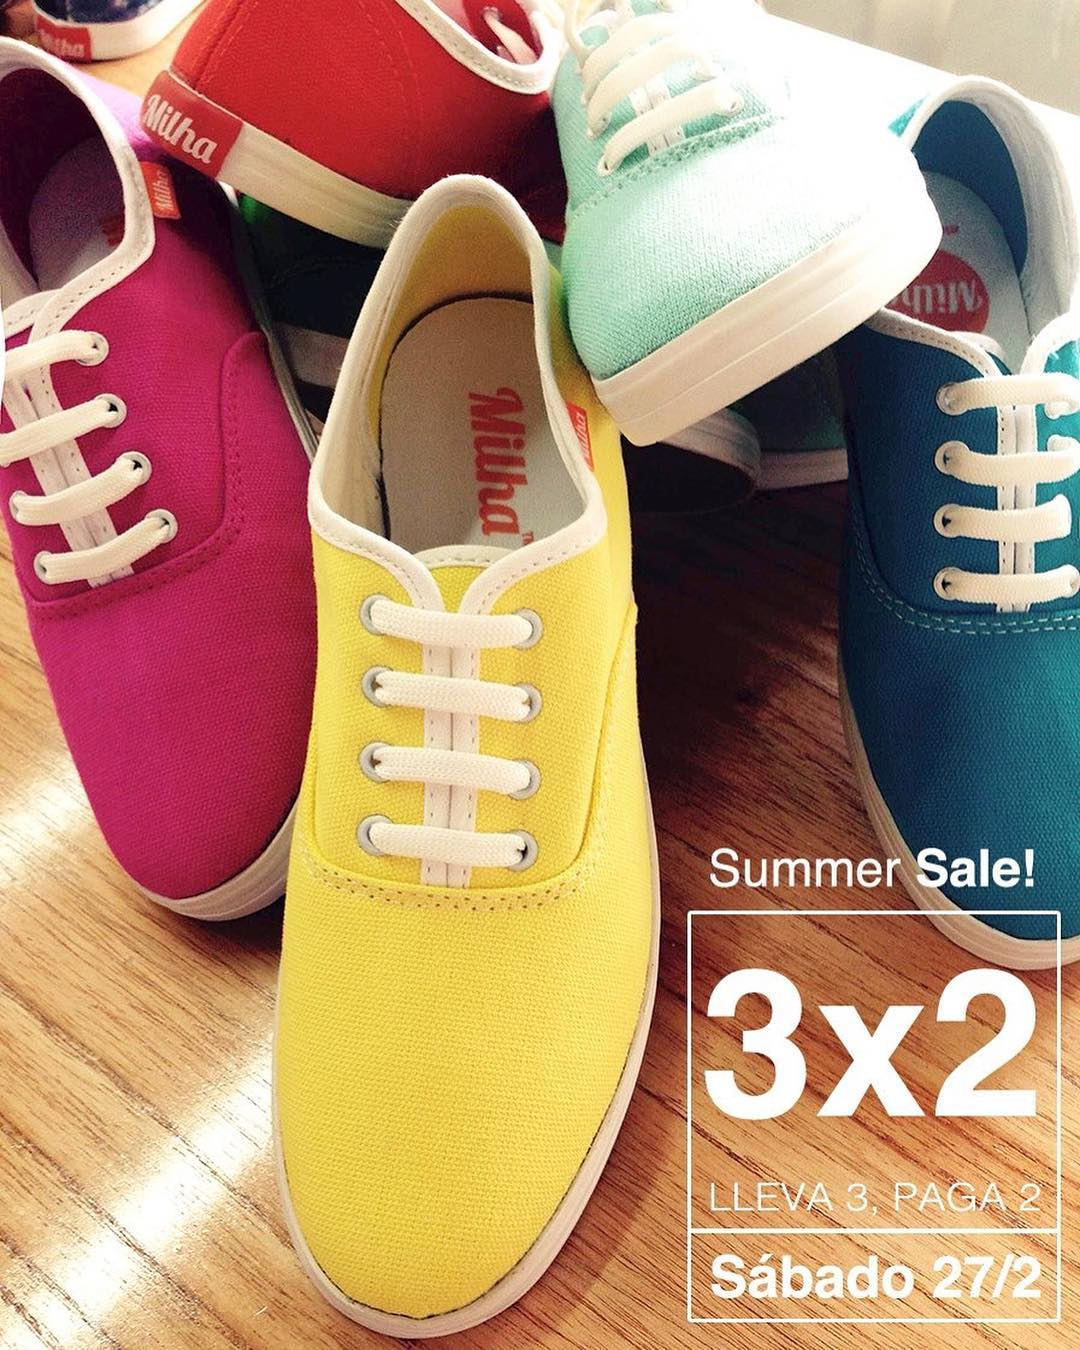 Hoy Summer Sale 3X2 !!!!! De 11 a 18 hs! Showroom Milha: Charcas 5258 of. 502 (Palermo). Te esperamos!!! www.milha.com.ar #milha #summer #sale